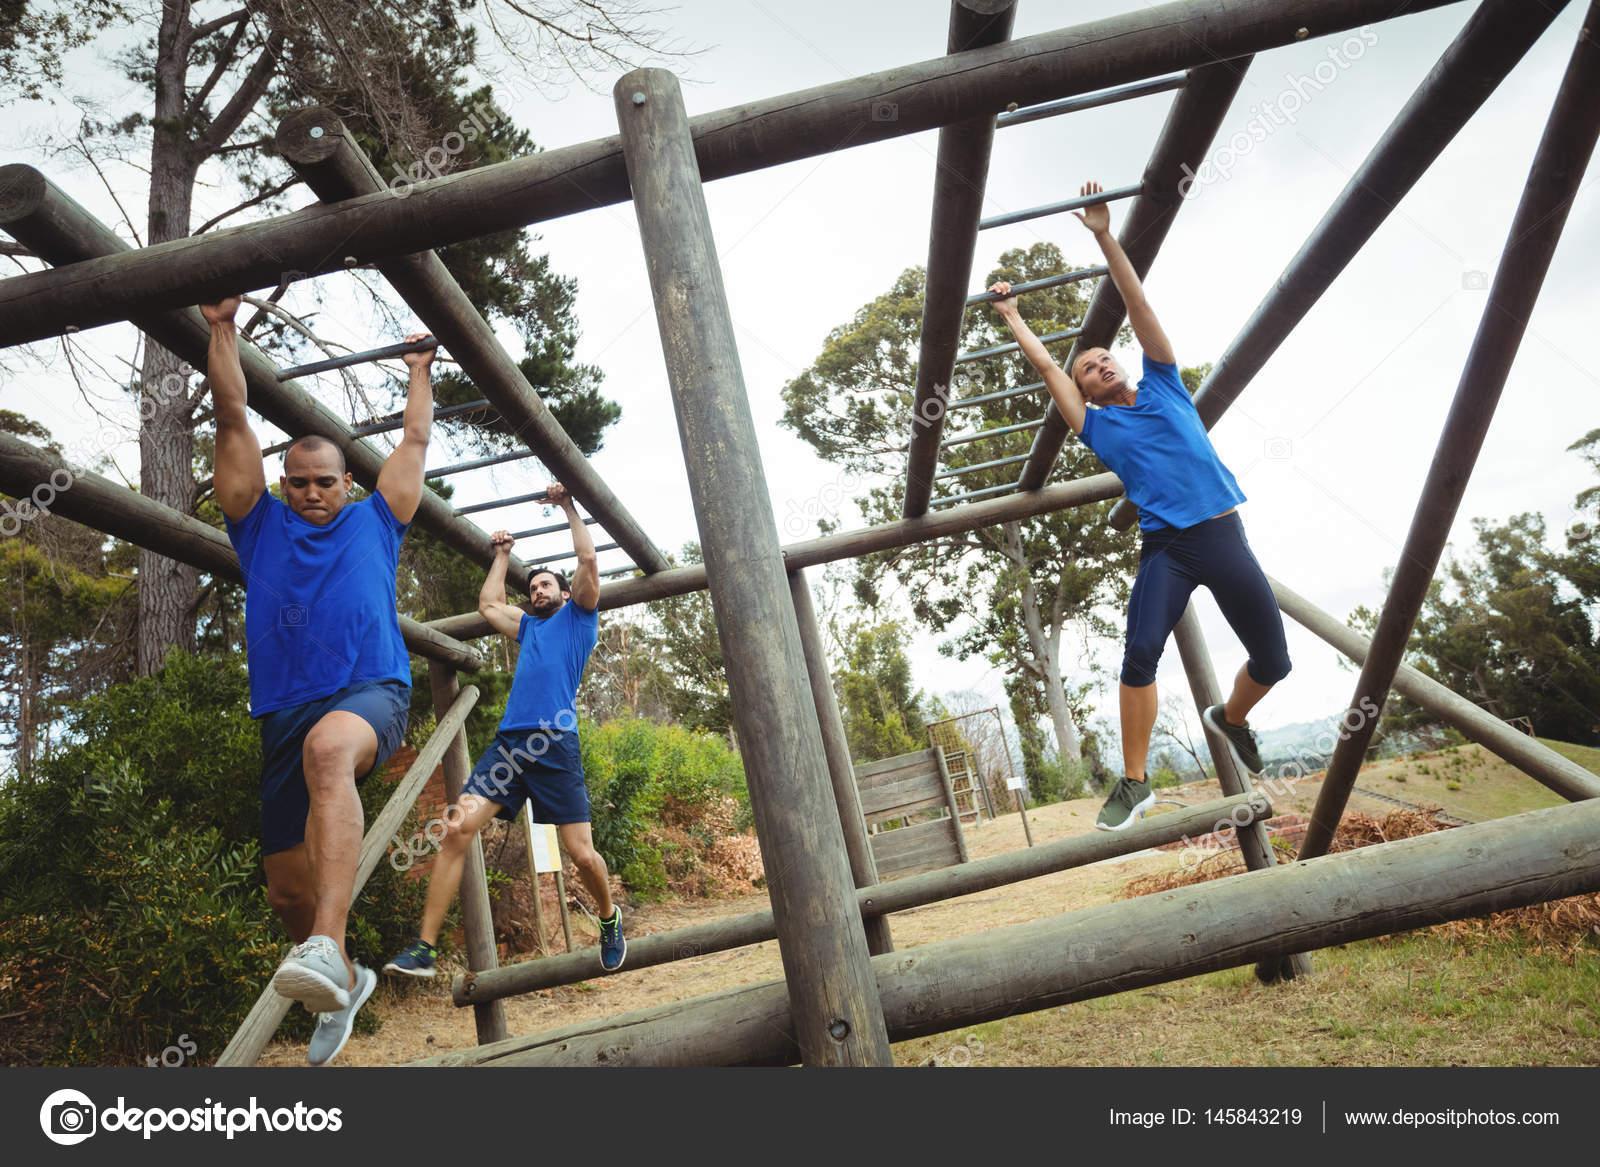 Klettergerüst Monkey Bar : Fit menschen klettern klettergerüst u stockfoto wavebreakmedia